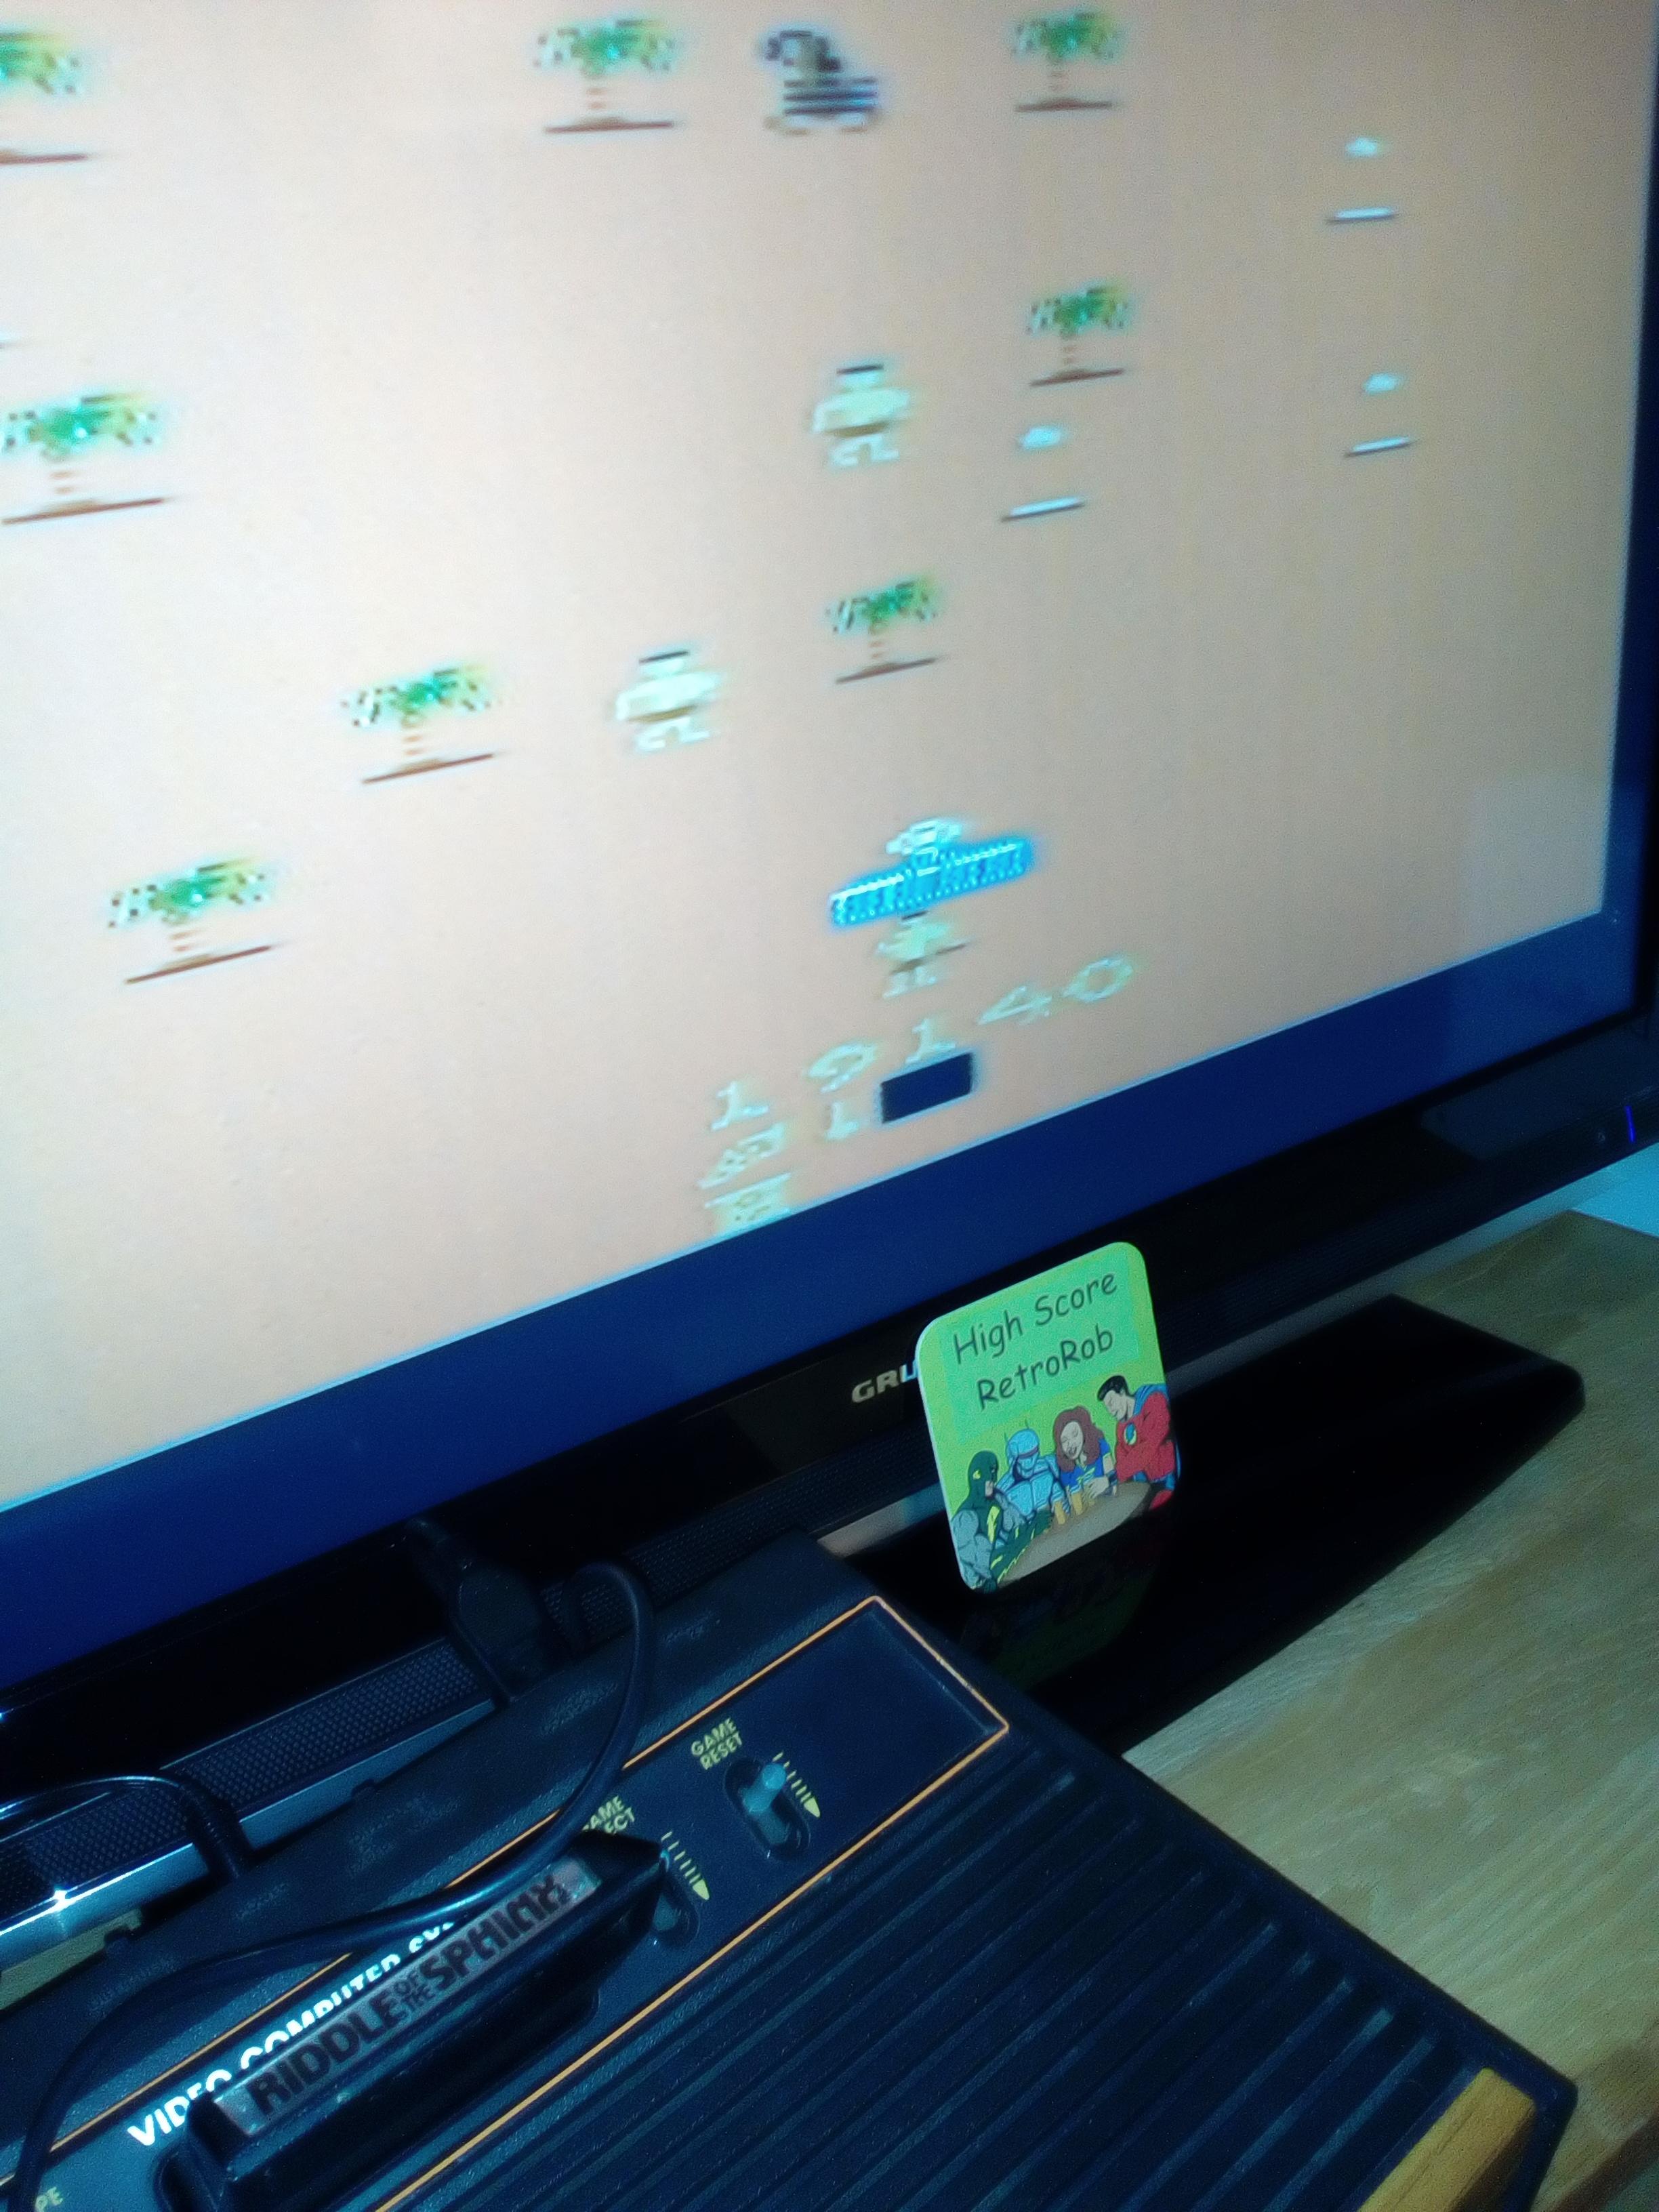 RetroRob: Riddle of the Sphinx (Atari 2600 Novice/B) 19,140 points on 2018-03-09 10:36:52